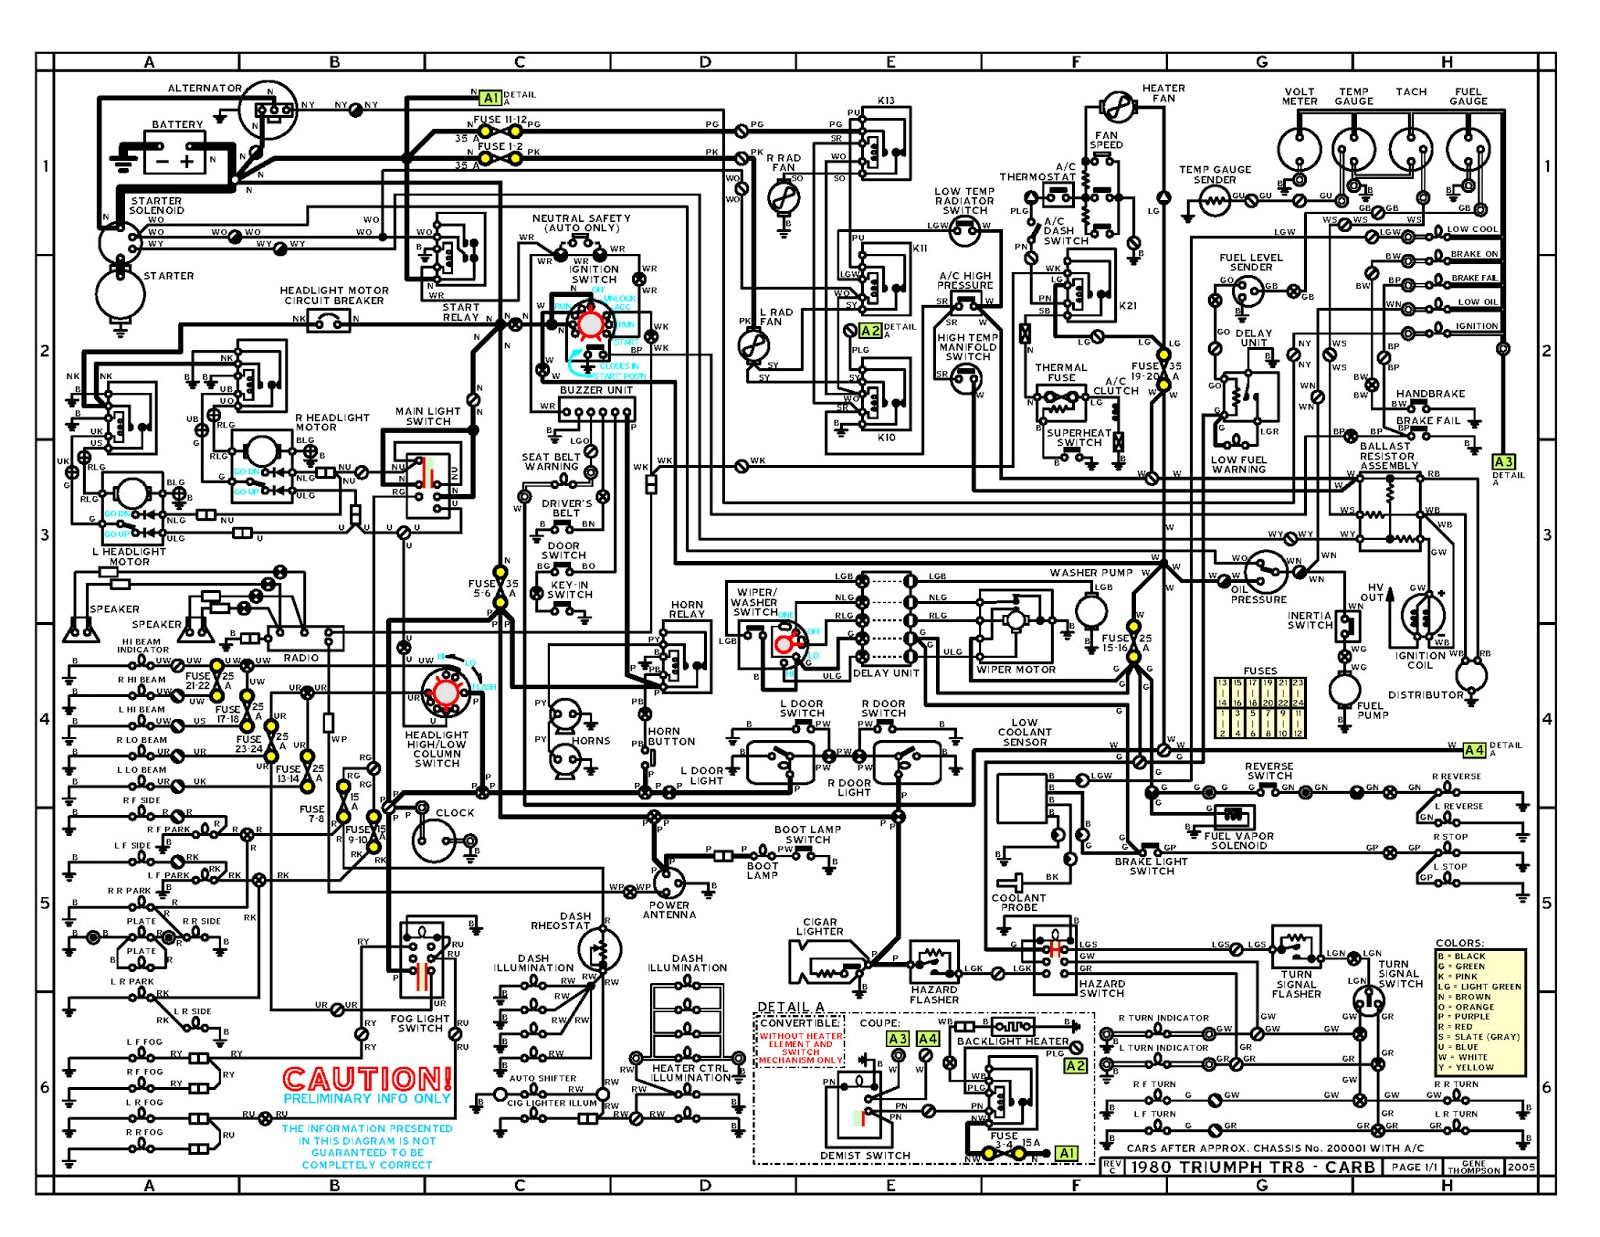 wiring diagram 1970 triumph gt6 schematic diagrams mercury outboard engine diagrams triumph gt6 mk3 wiring diagram somurich com mercury zephyr wiring diagram triumph gt6 mk3 wiring diagram